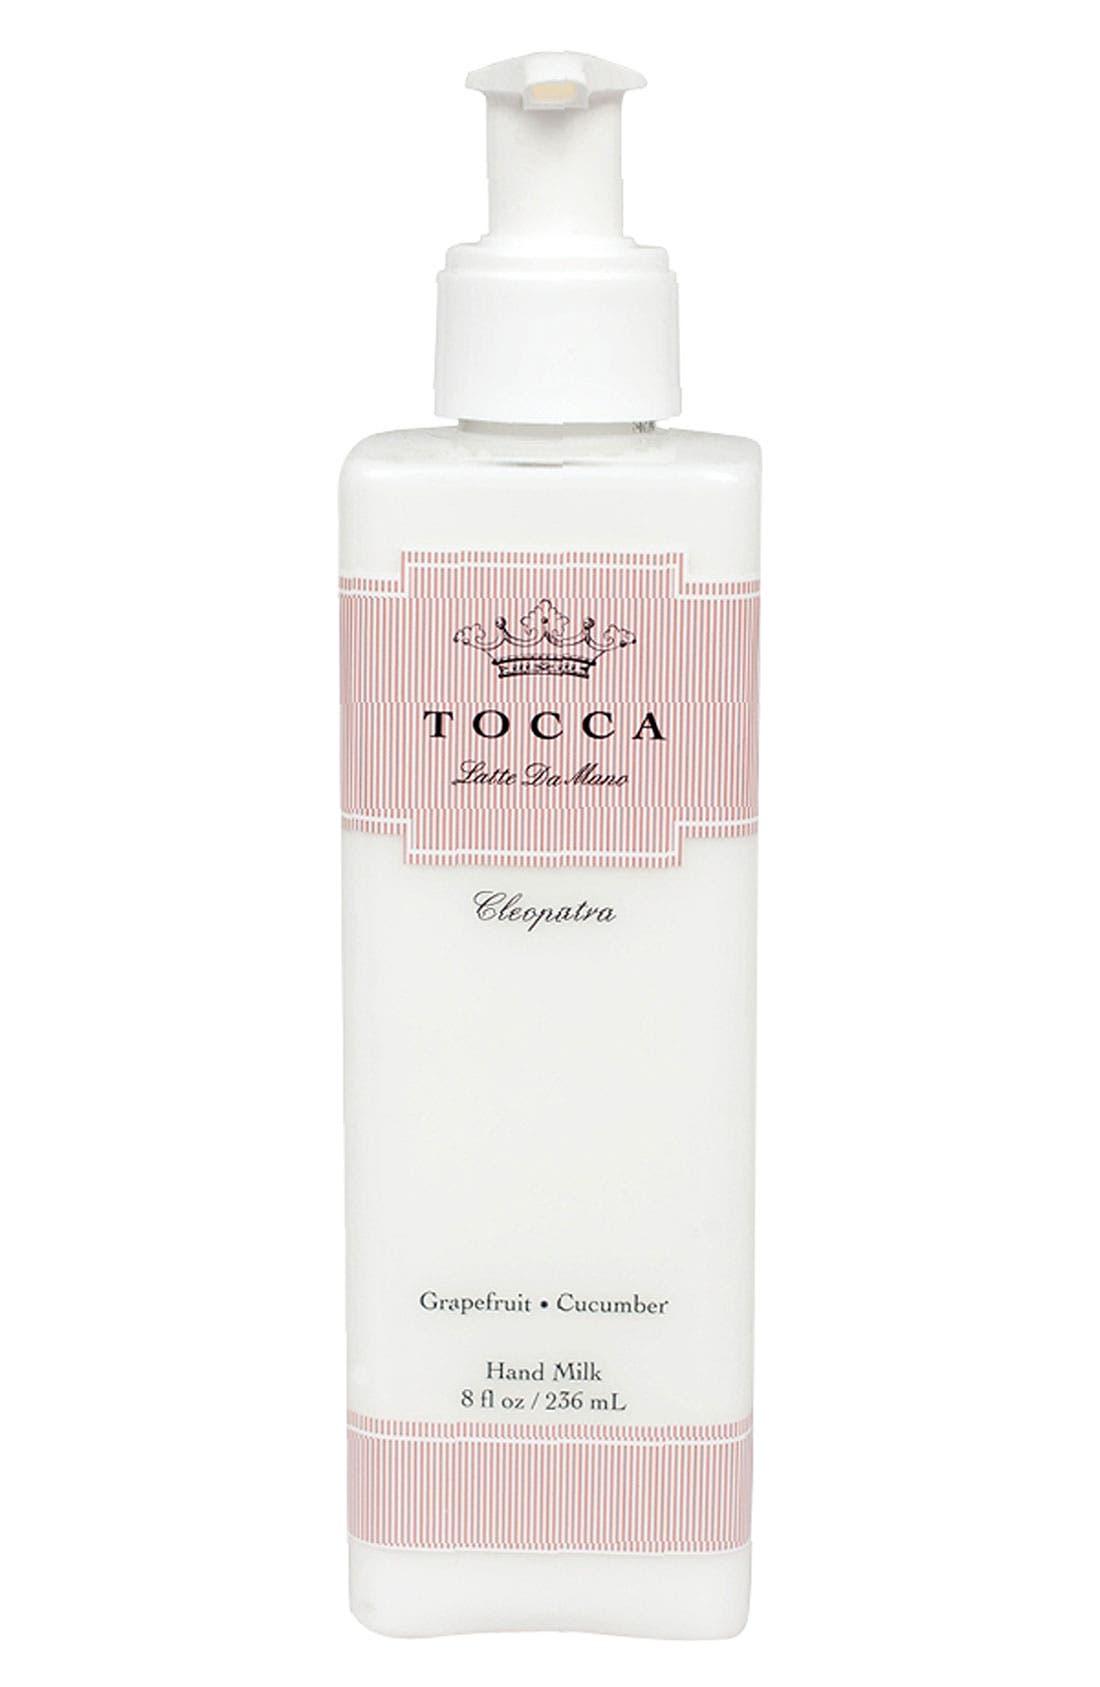 Main Image - TOCCA 'Cleopatra' Hand Milk